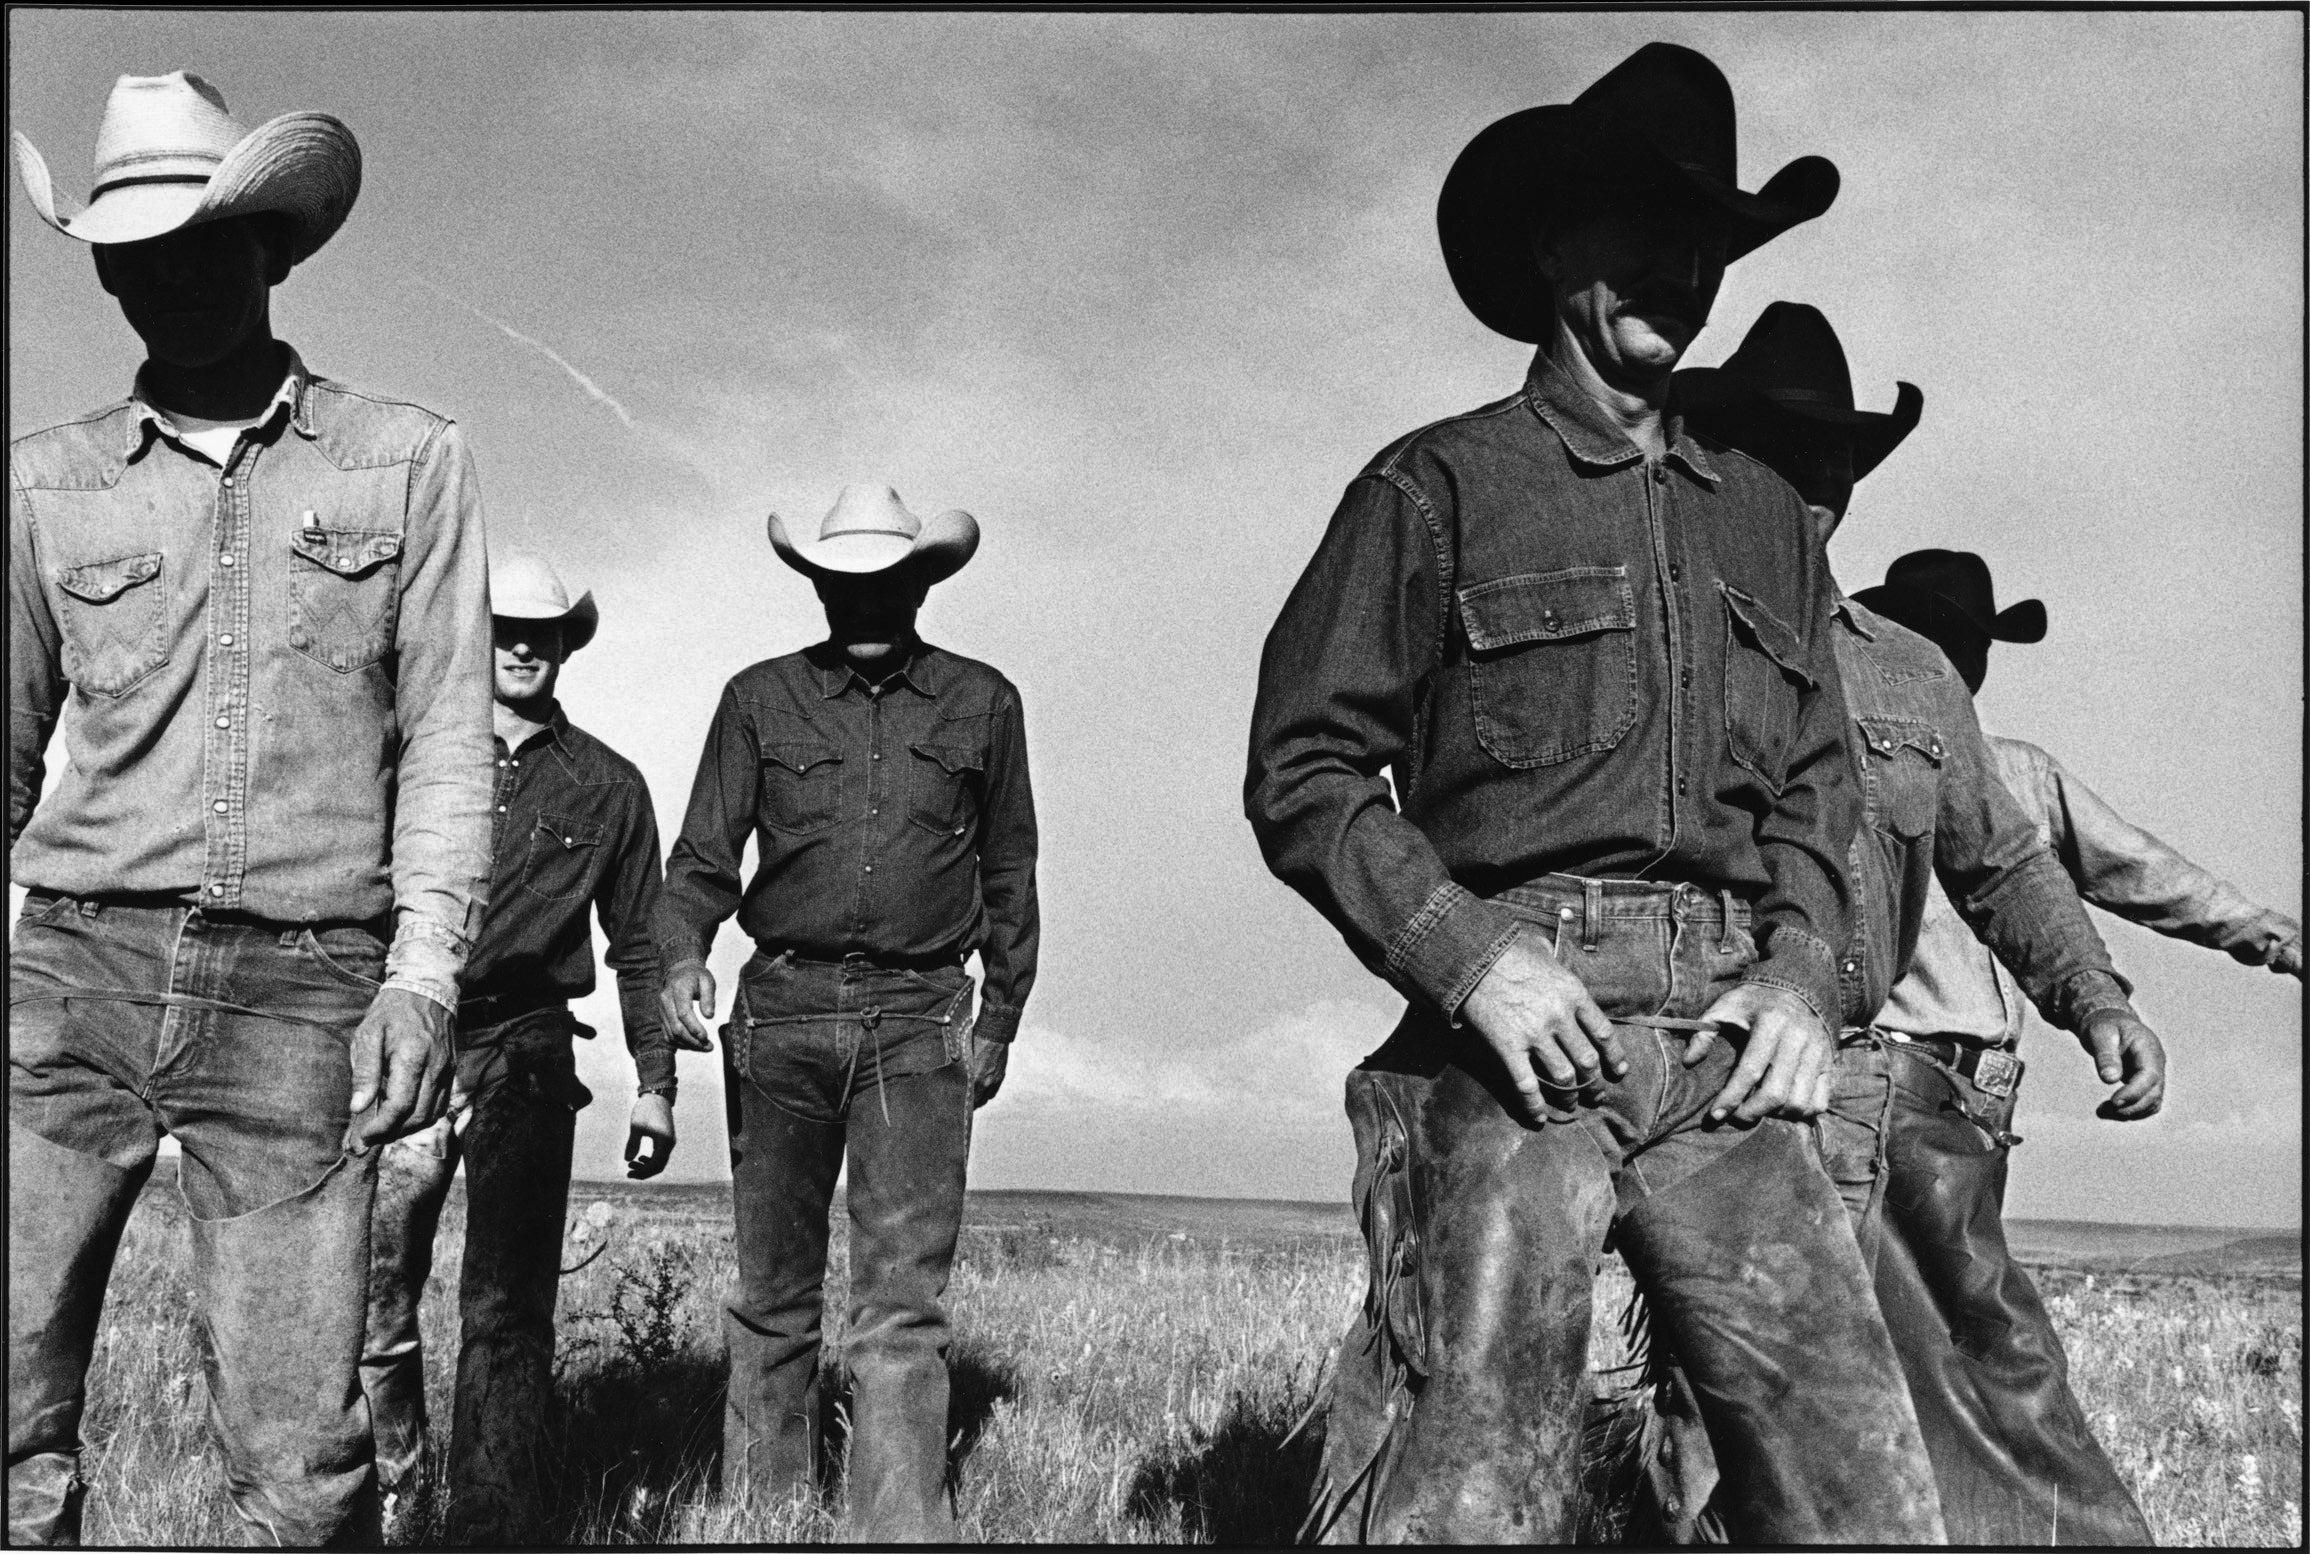 Interview: Laura Wilson on the Wild West